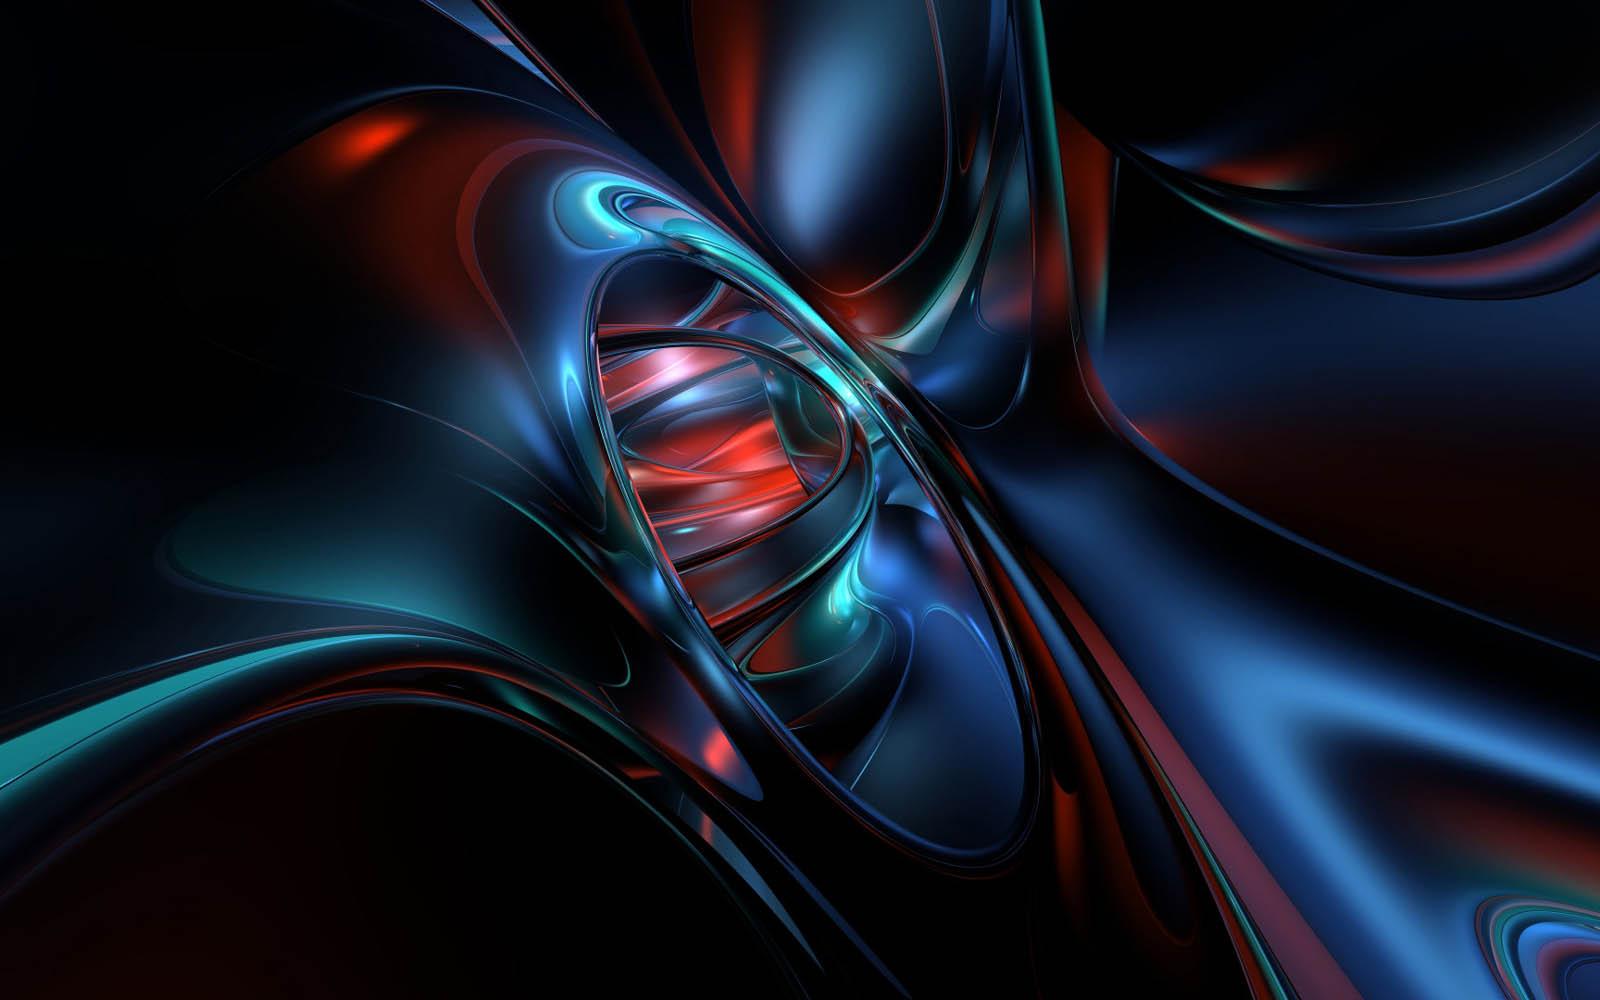 Wallpaper Keren 3d Hd: Gambar-Gambar 3D Keren Dengan Nuansa Gelap